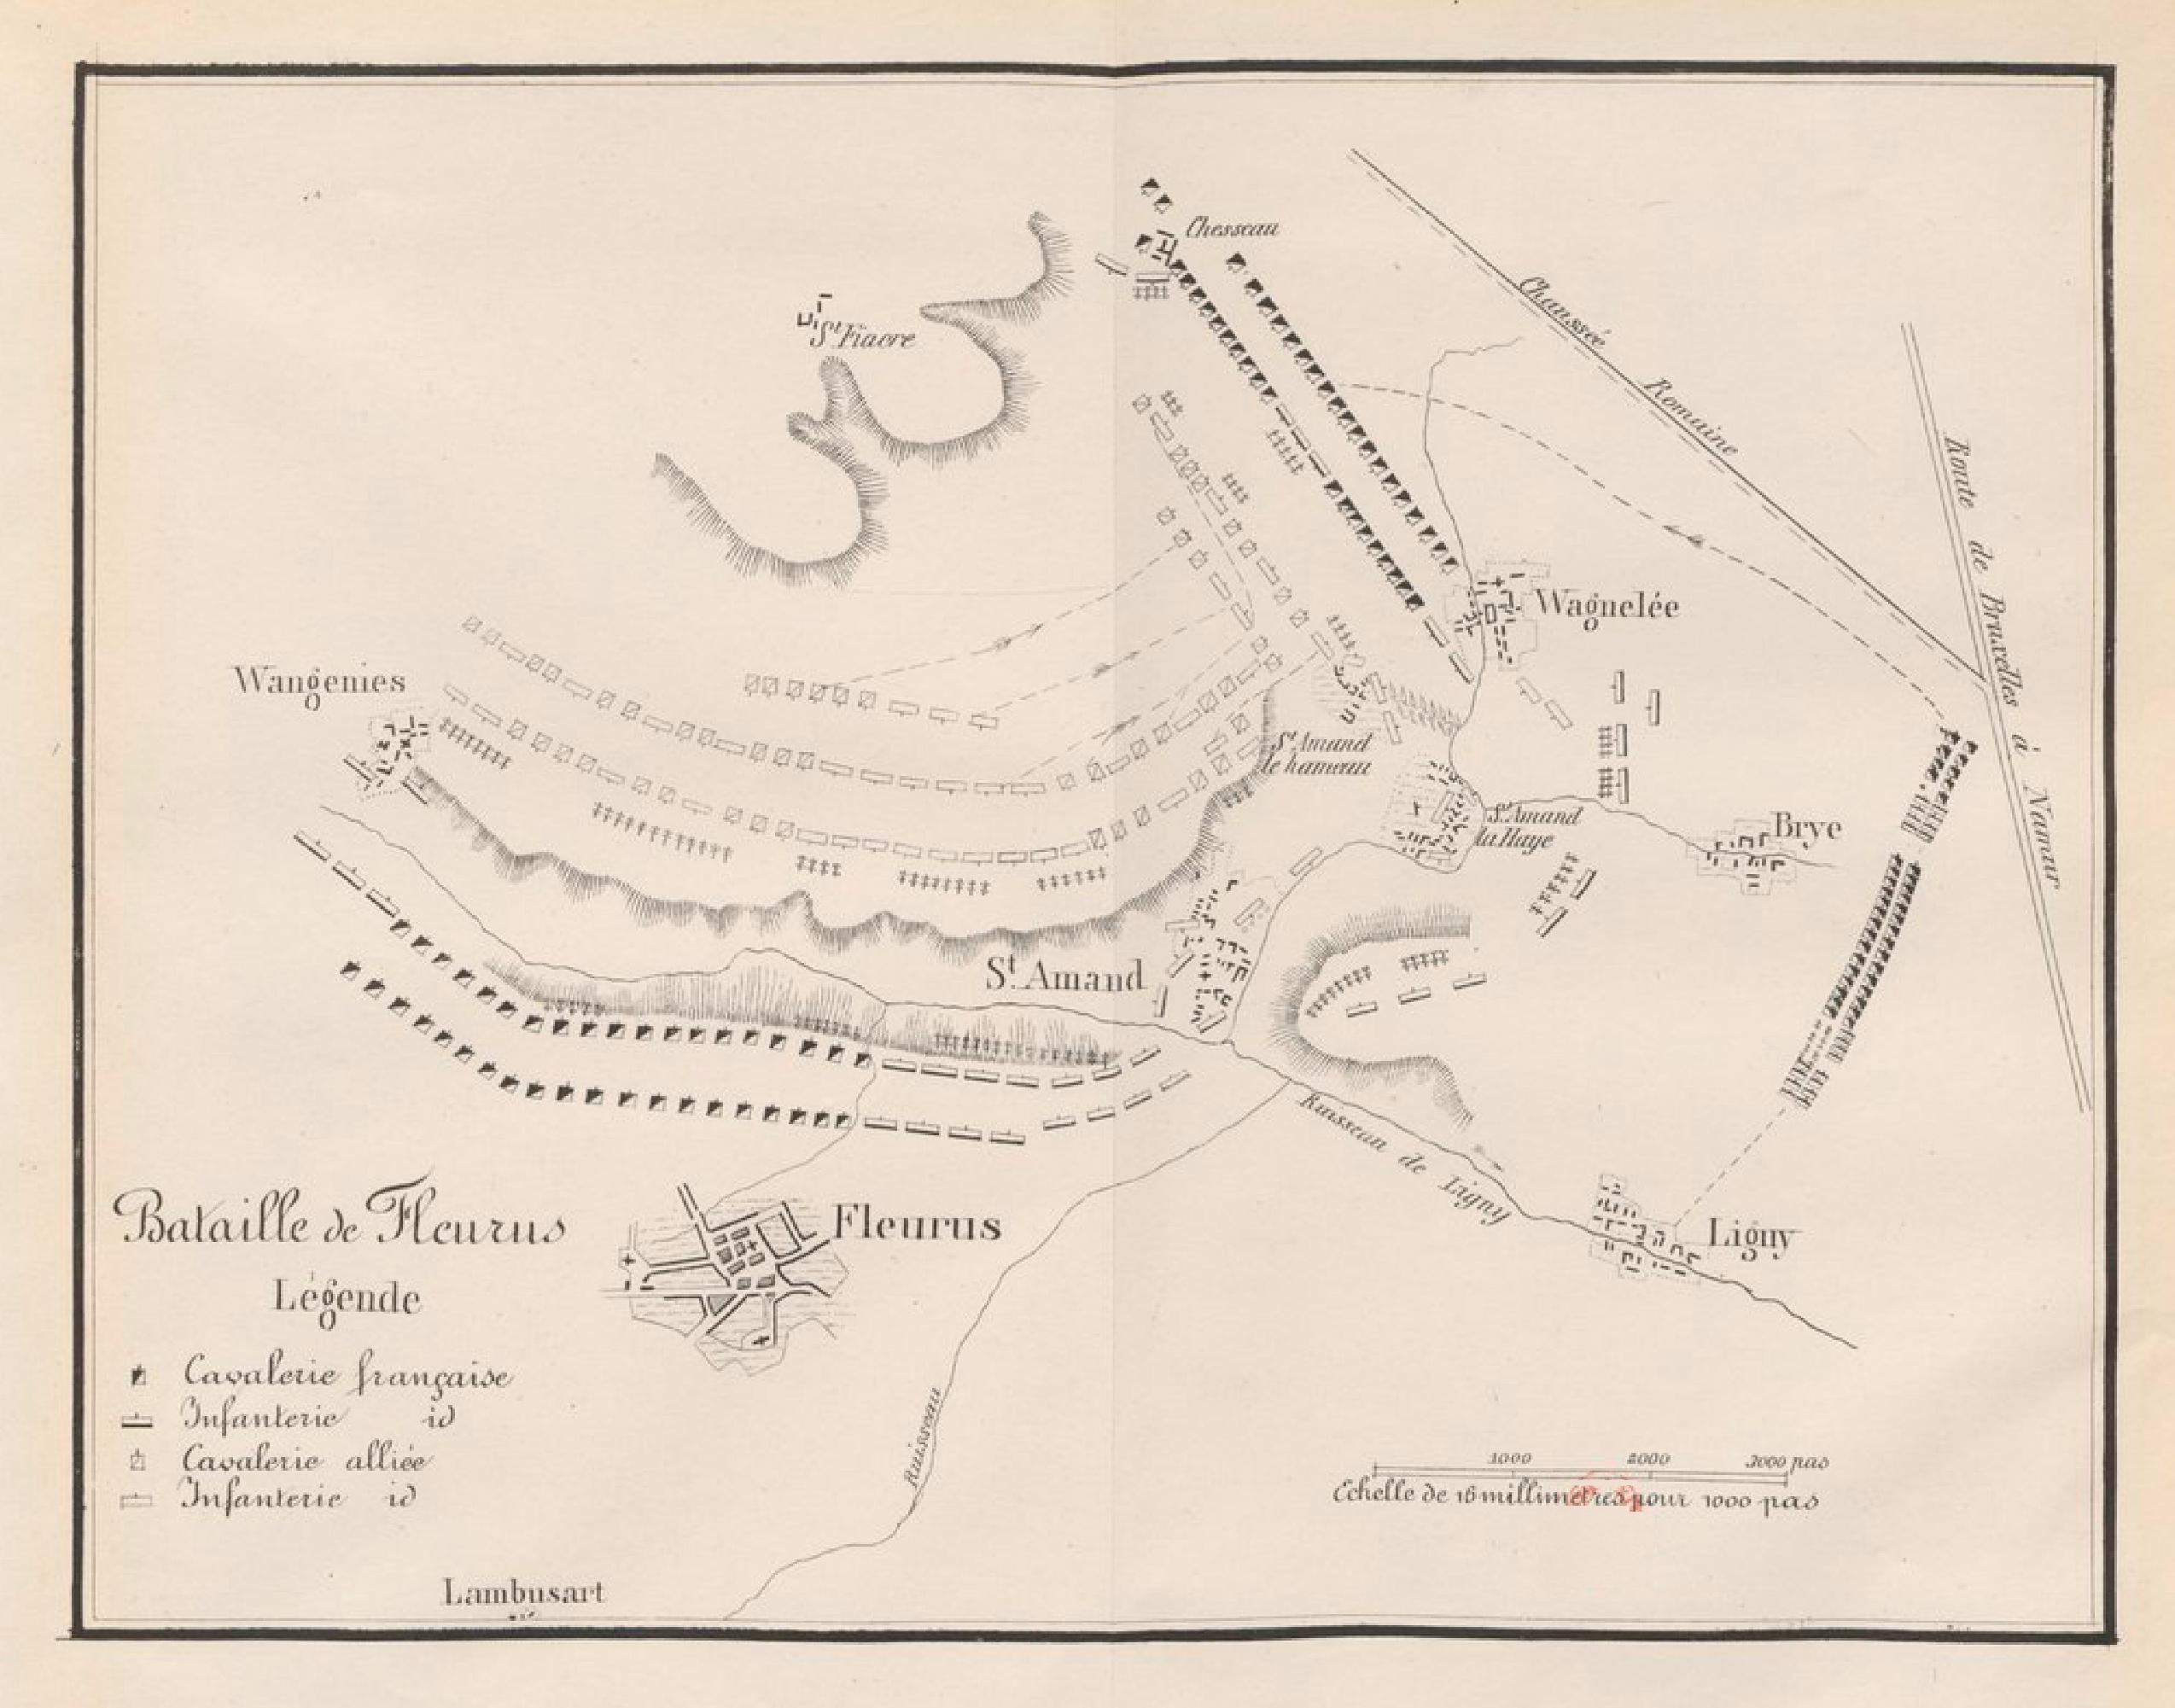 Файл:Bataille de Fleurus (1690).jpg